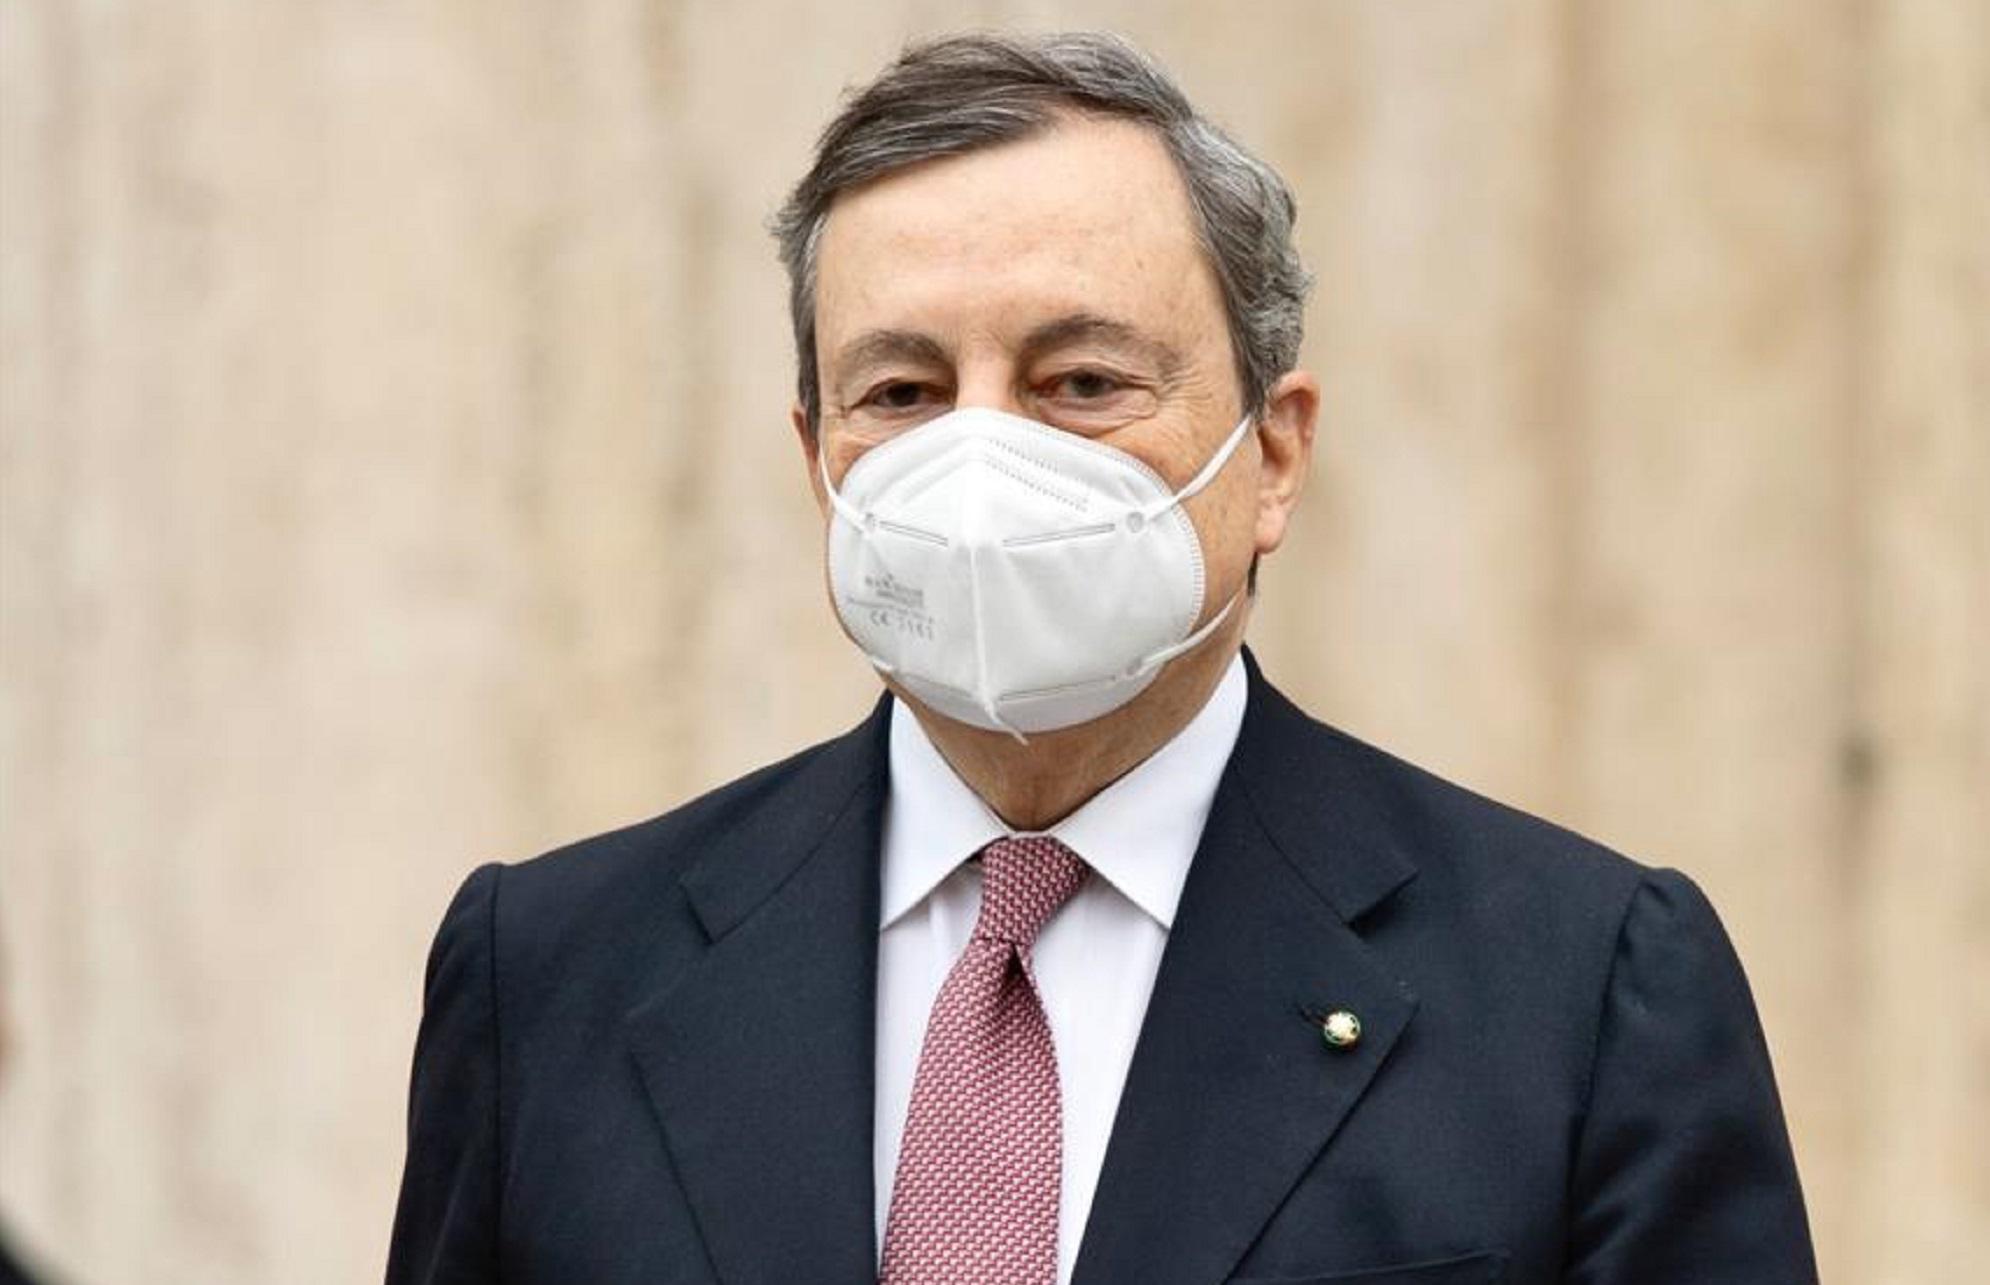 Pnrr, cabina di regia e Merkel: la giornata di Draghi